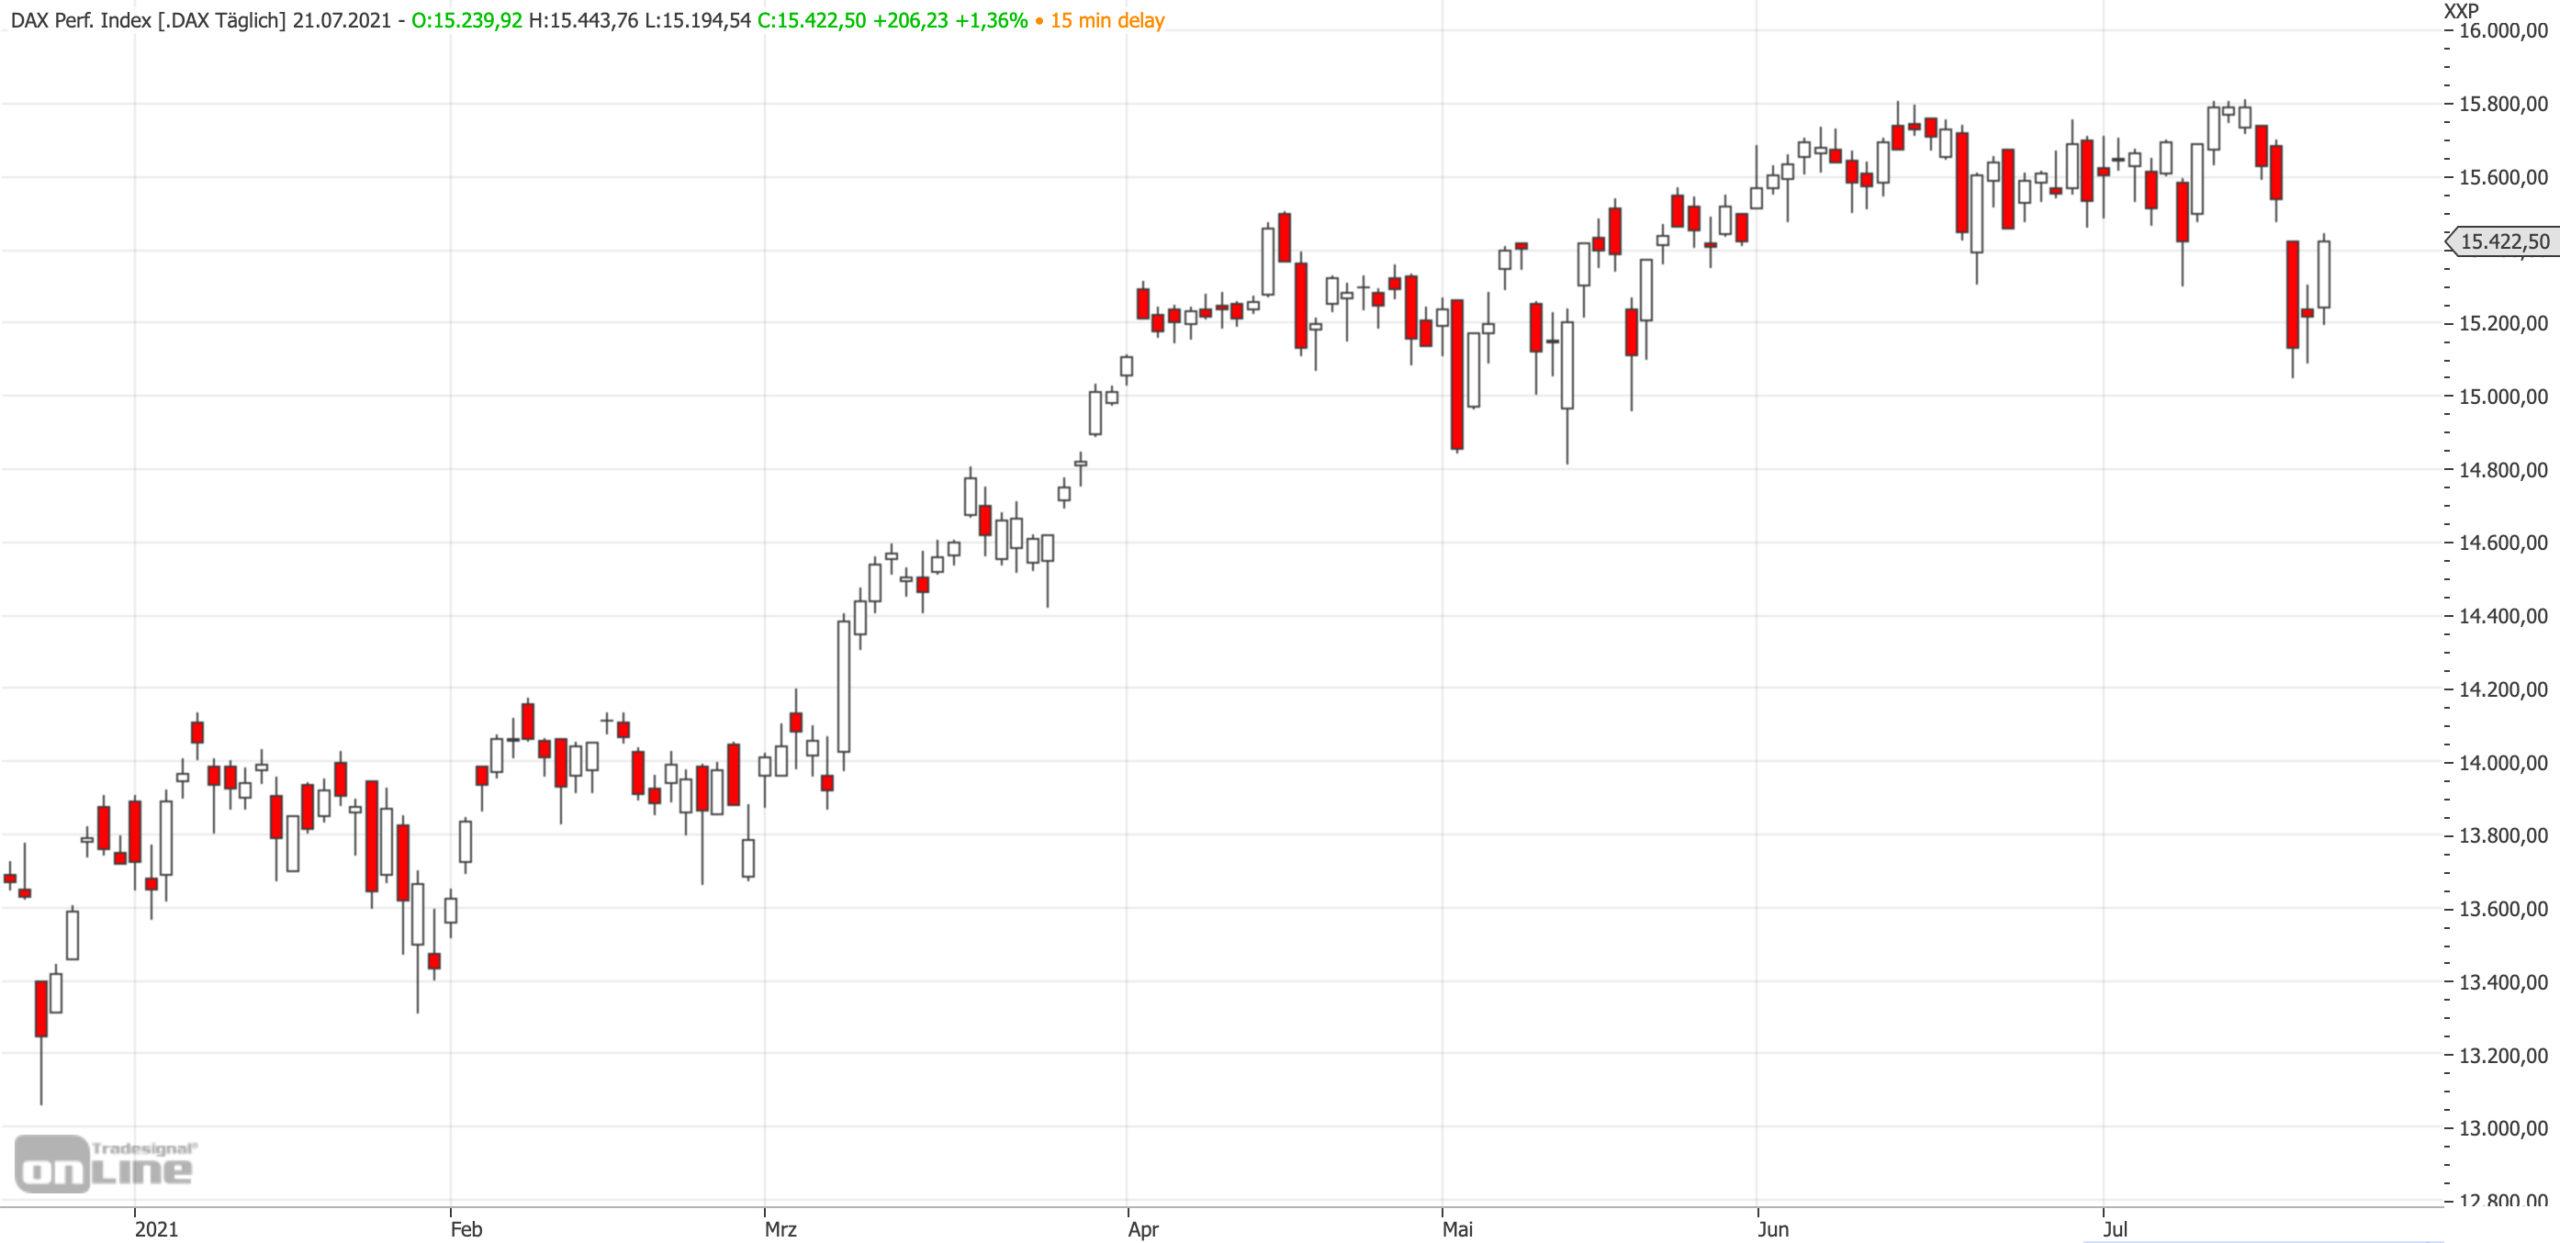 Mittelfristiger DAX-Chart am 21.07.2021